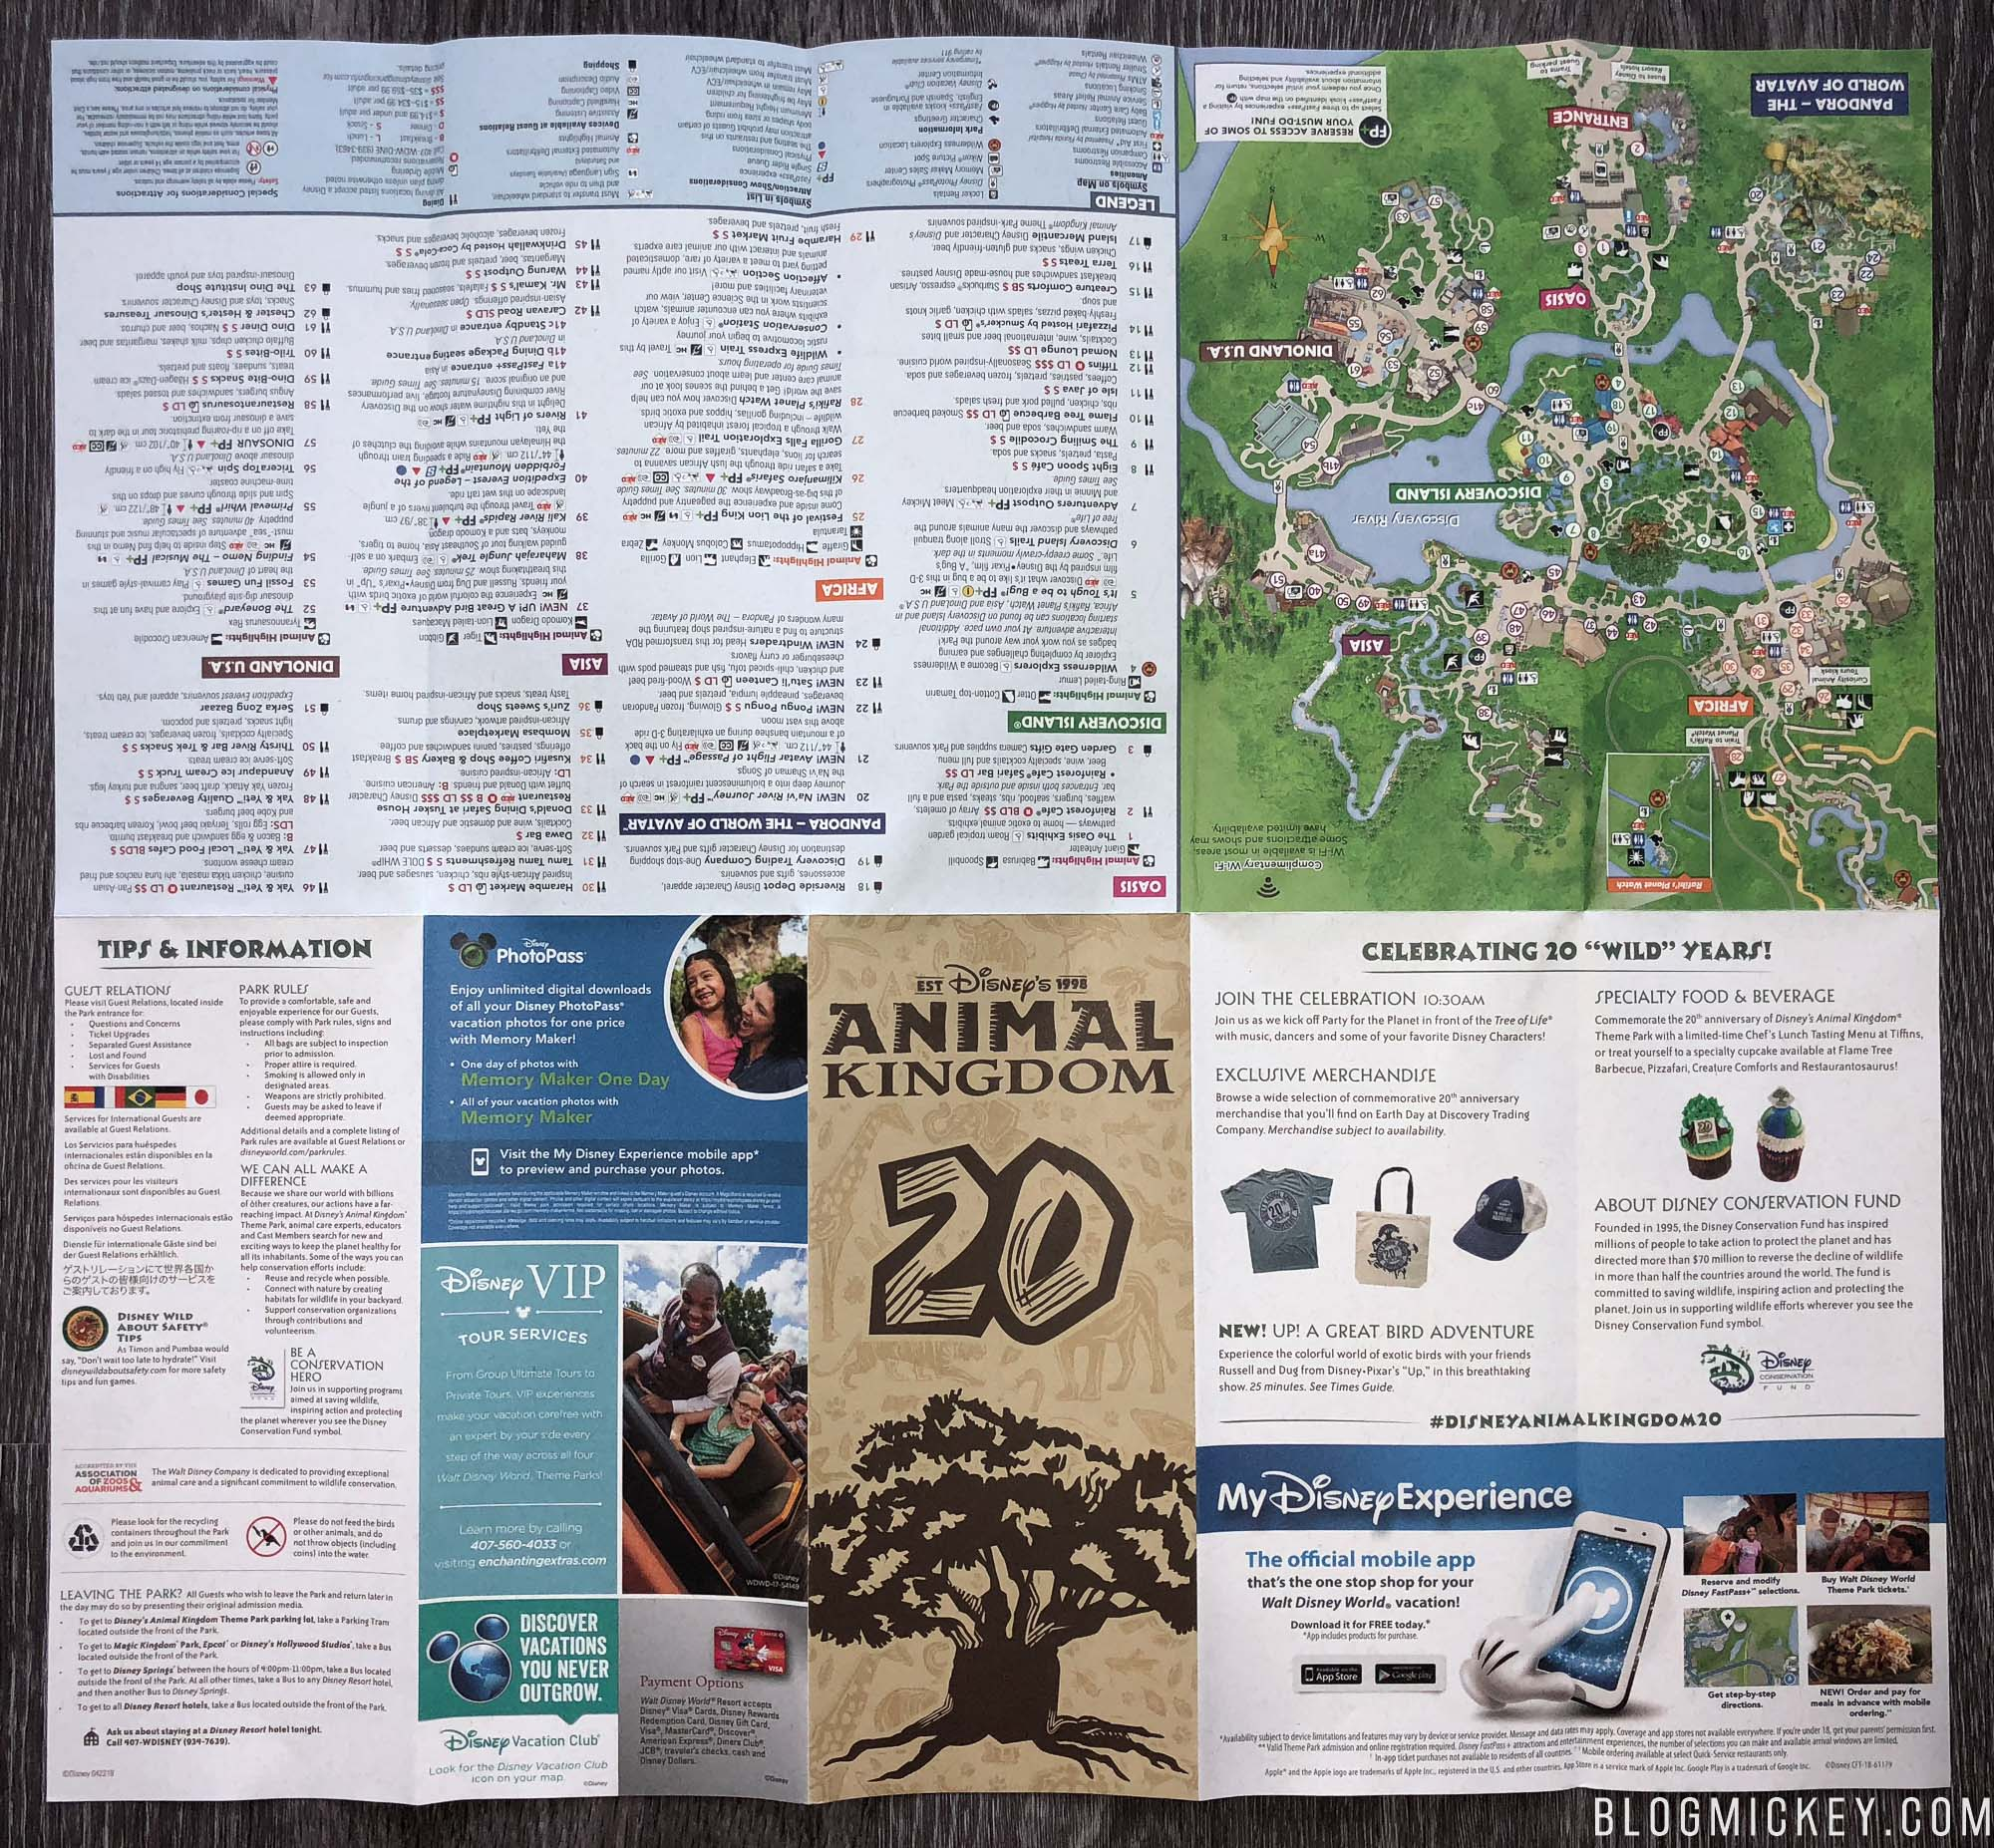 PHOTOS: Disney\'s Animal Kingdom 20th Anniversary Special ...